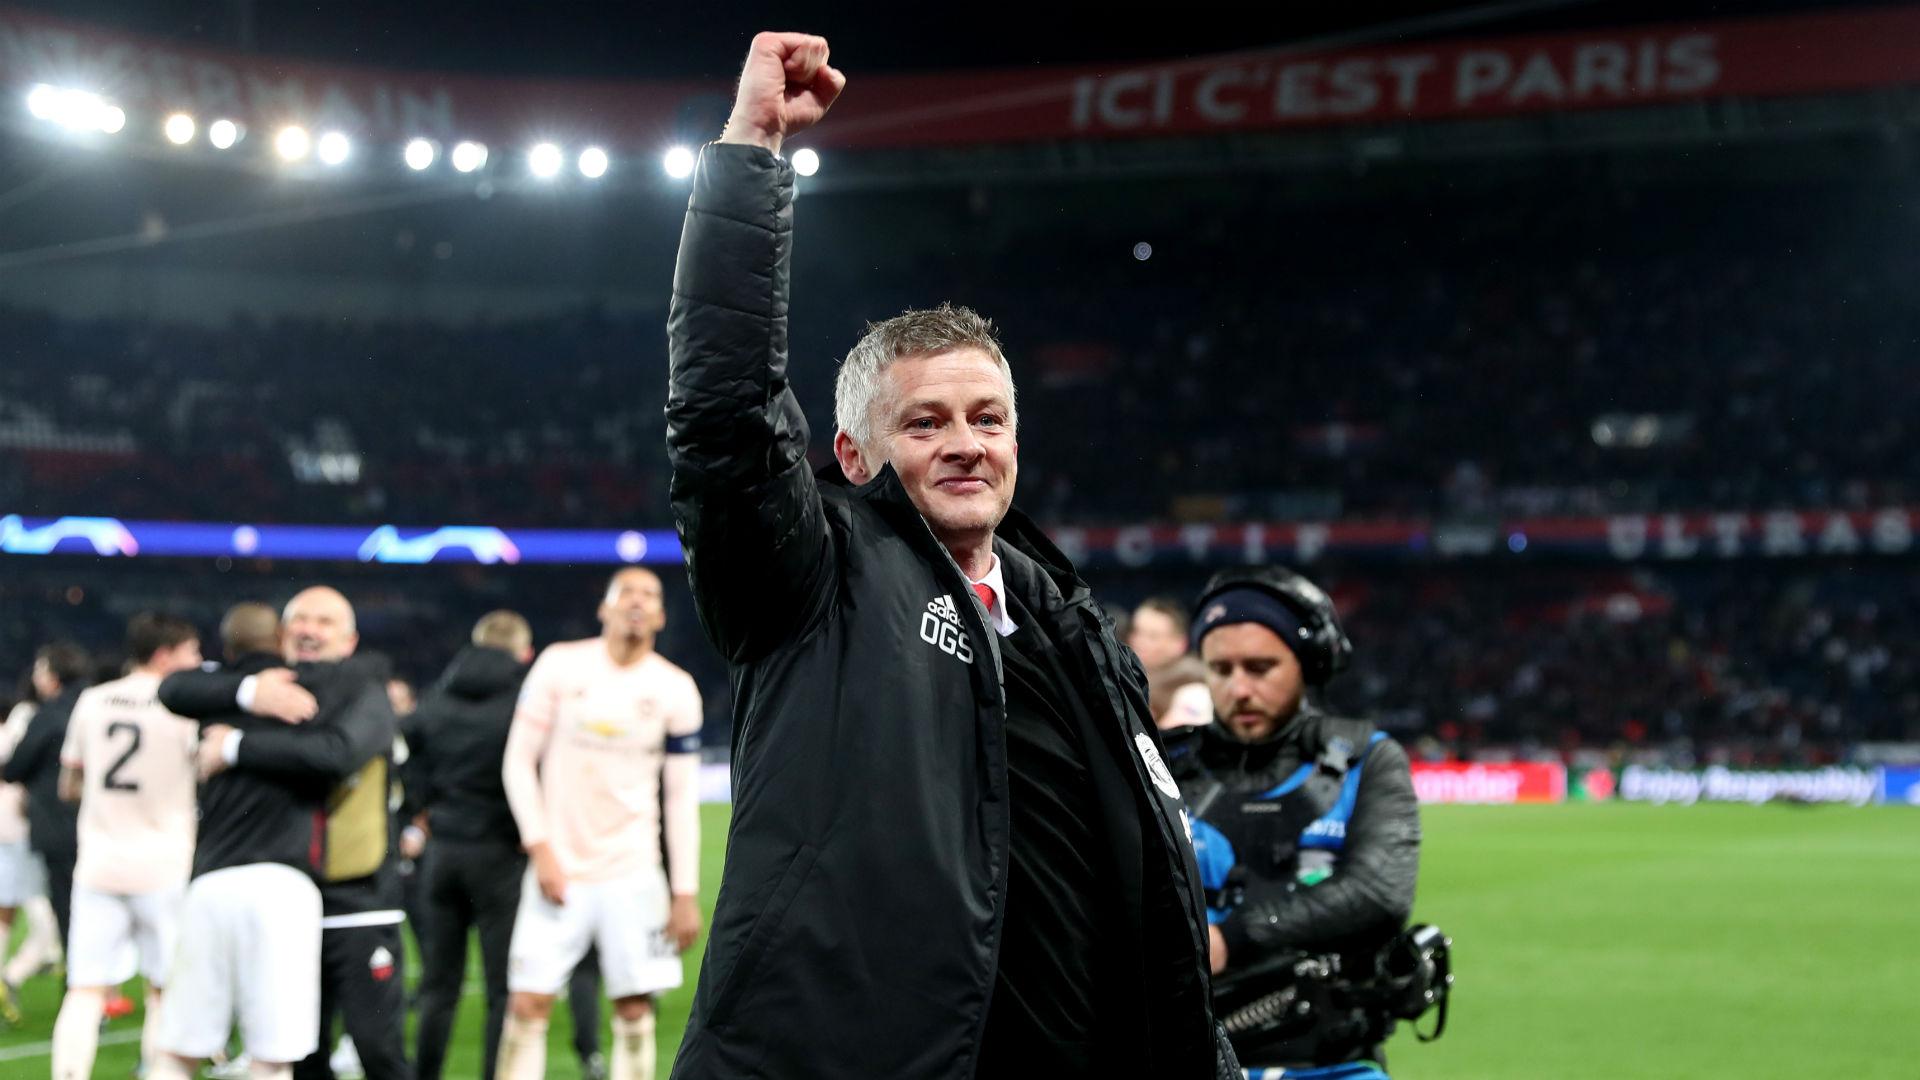 Ole Gunnar Solskjaer Manchester United PSG Champions League 06032019